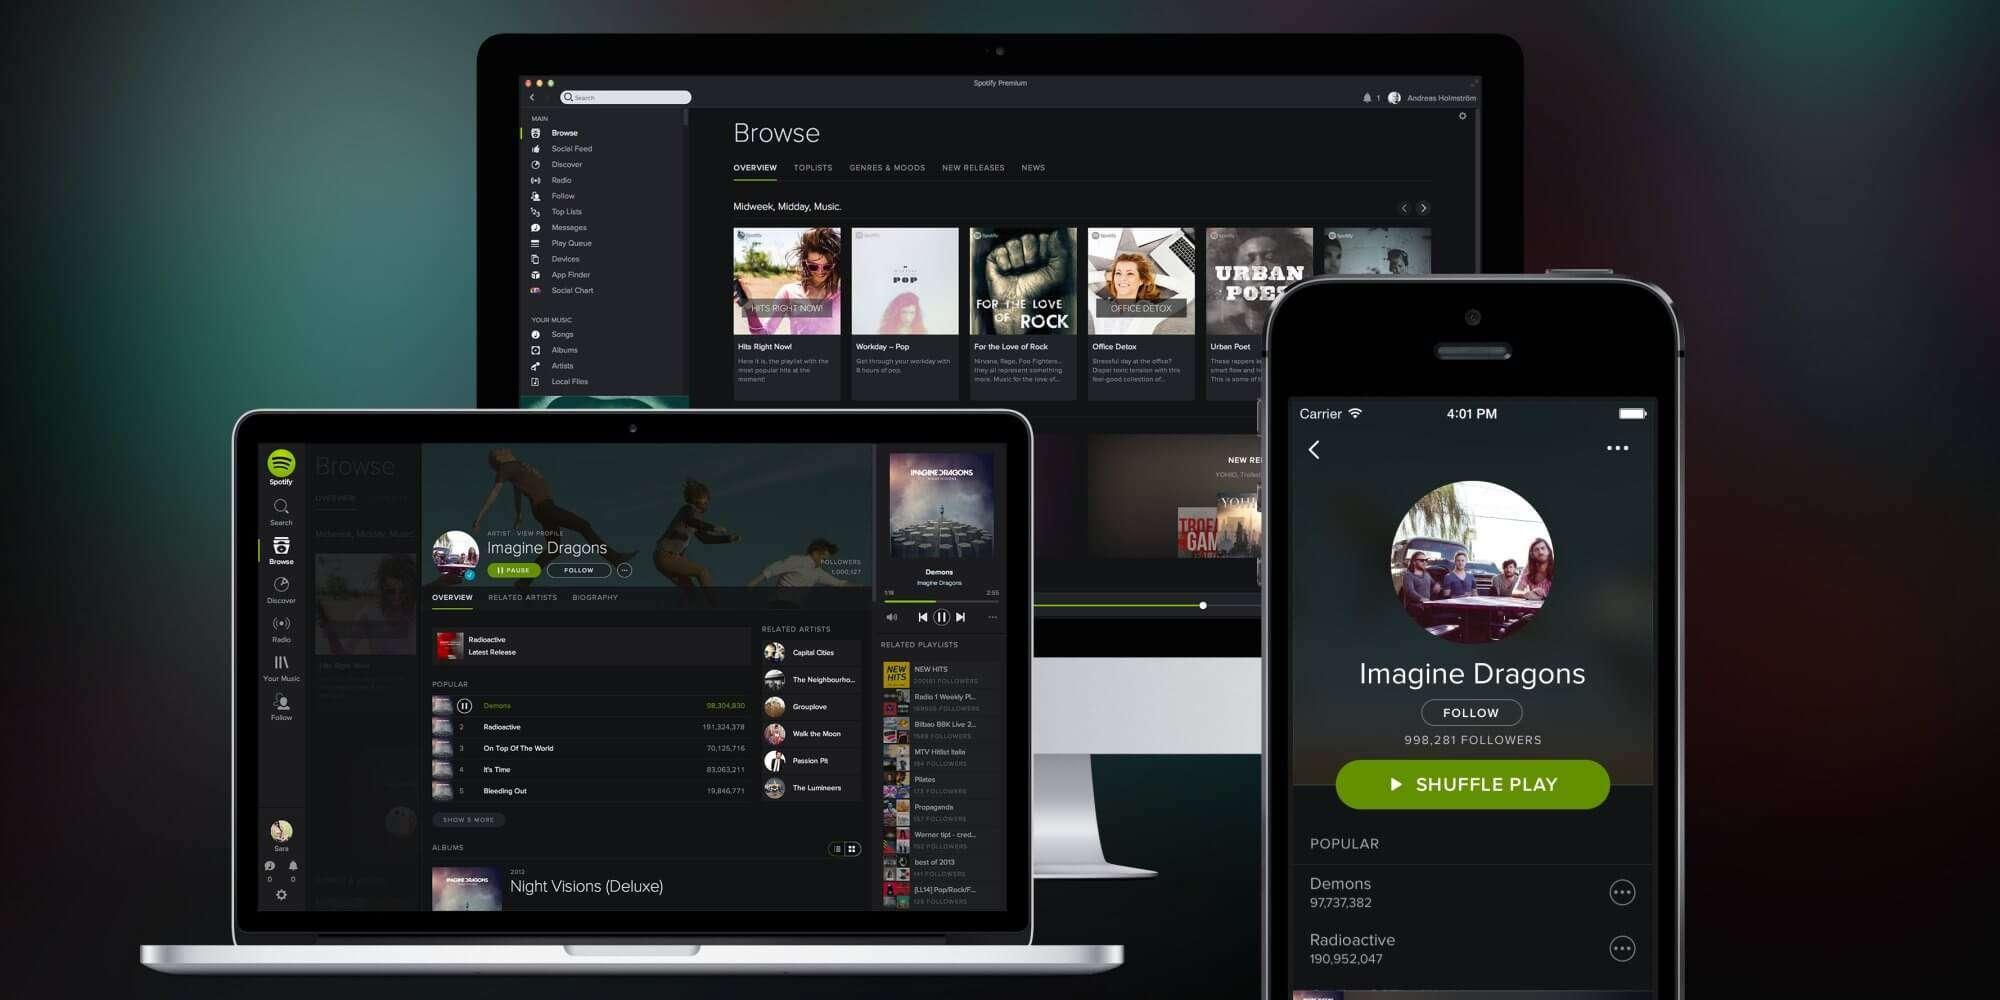 Spotify Settles Scores With Apple Inc. (NASDAQ:AAPL). Tops App Store - LearnBonds.com